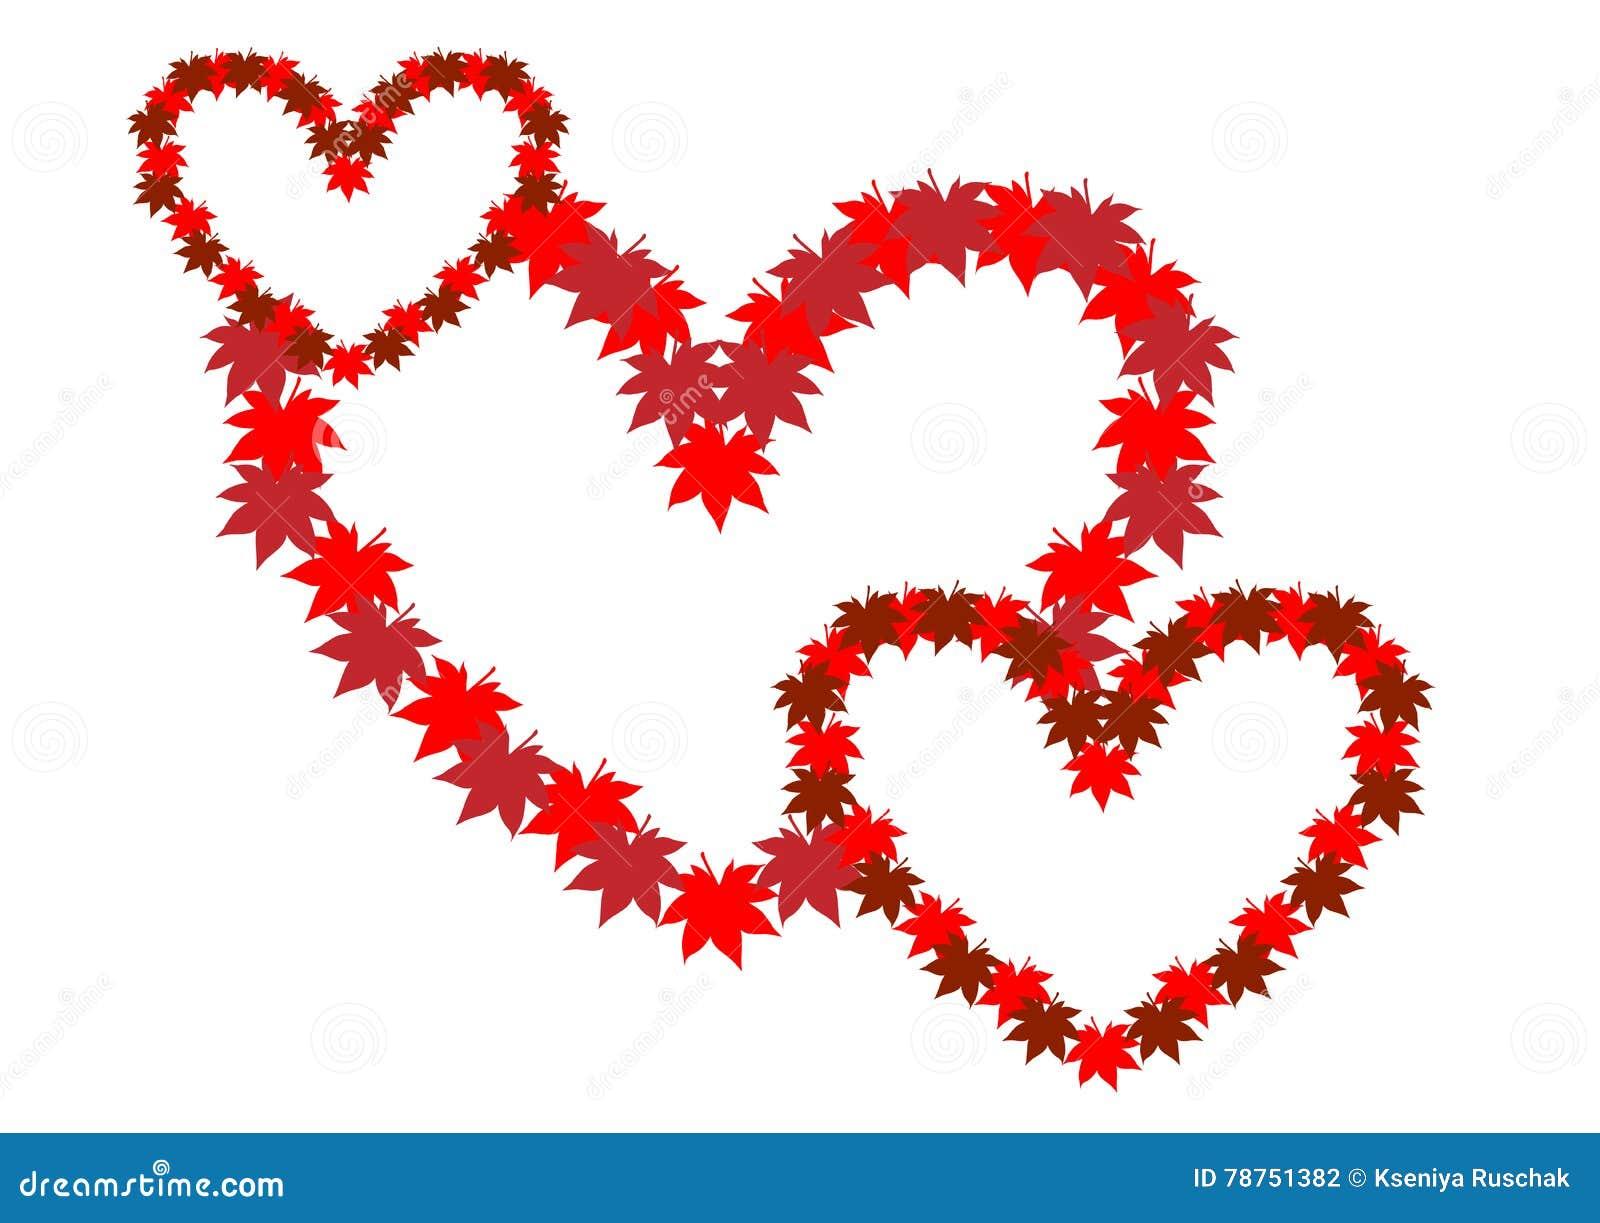 Three Intertwined Hearts Symbol Of Love Stock Vector Illustration